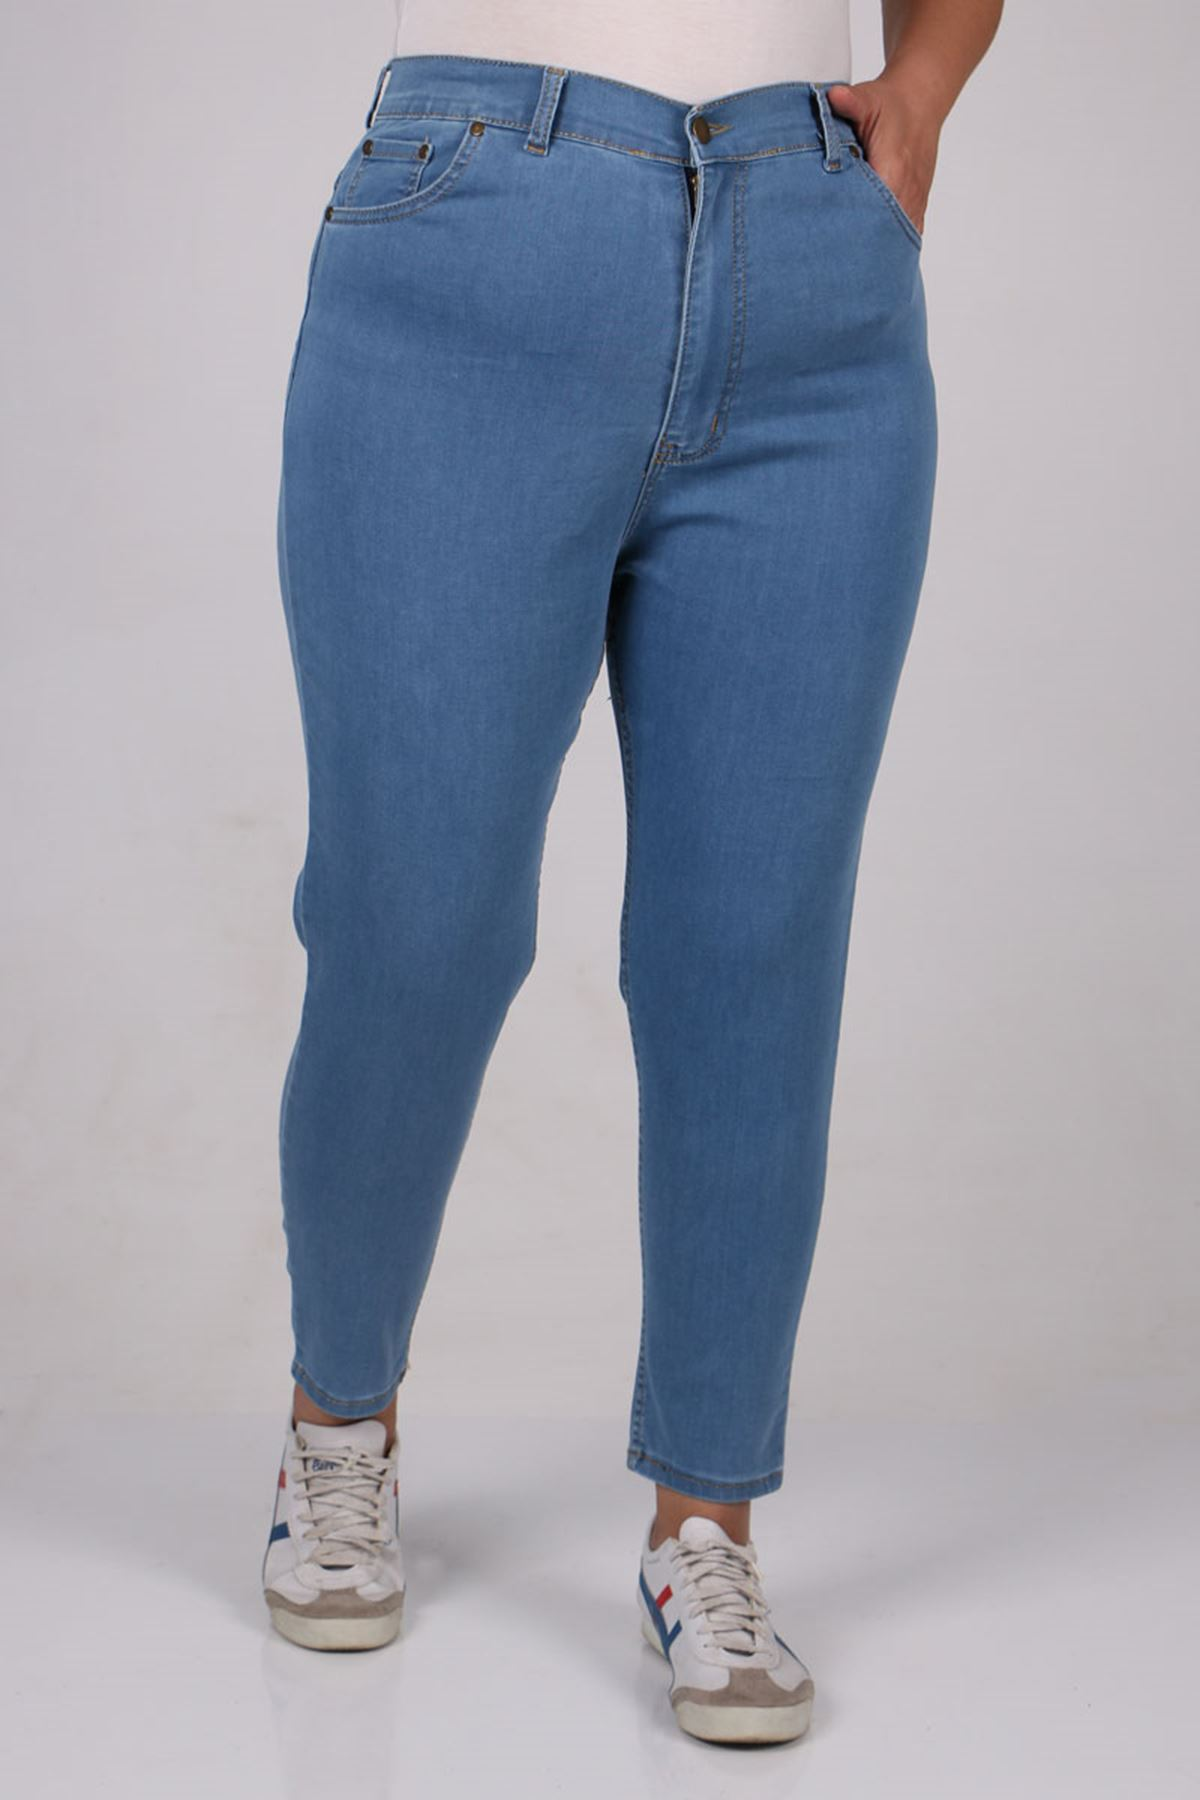 9107 Plus Size Skinny Leg Jeans - Petrol